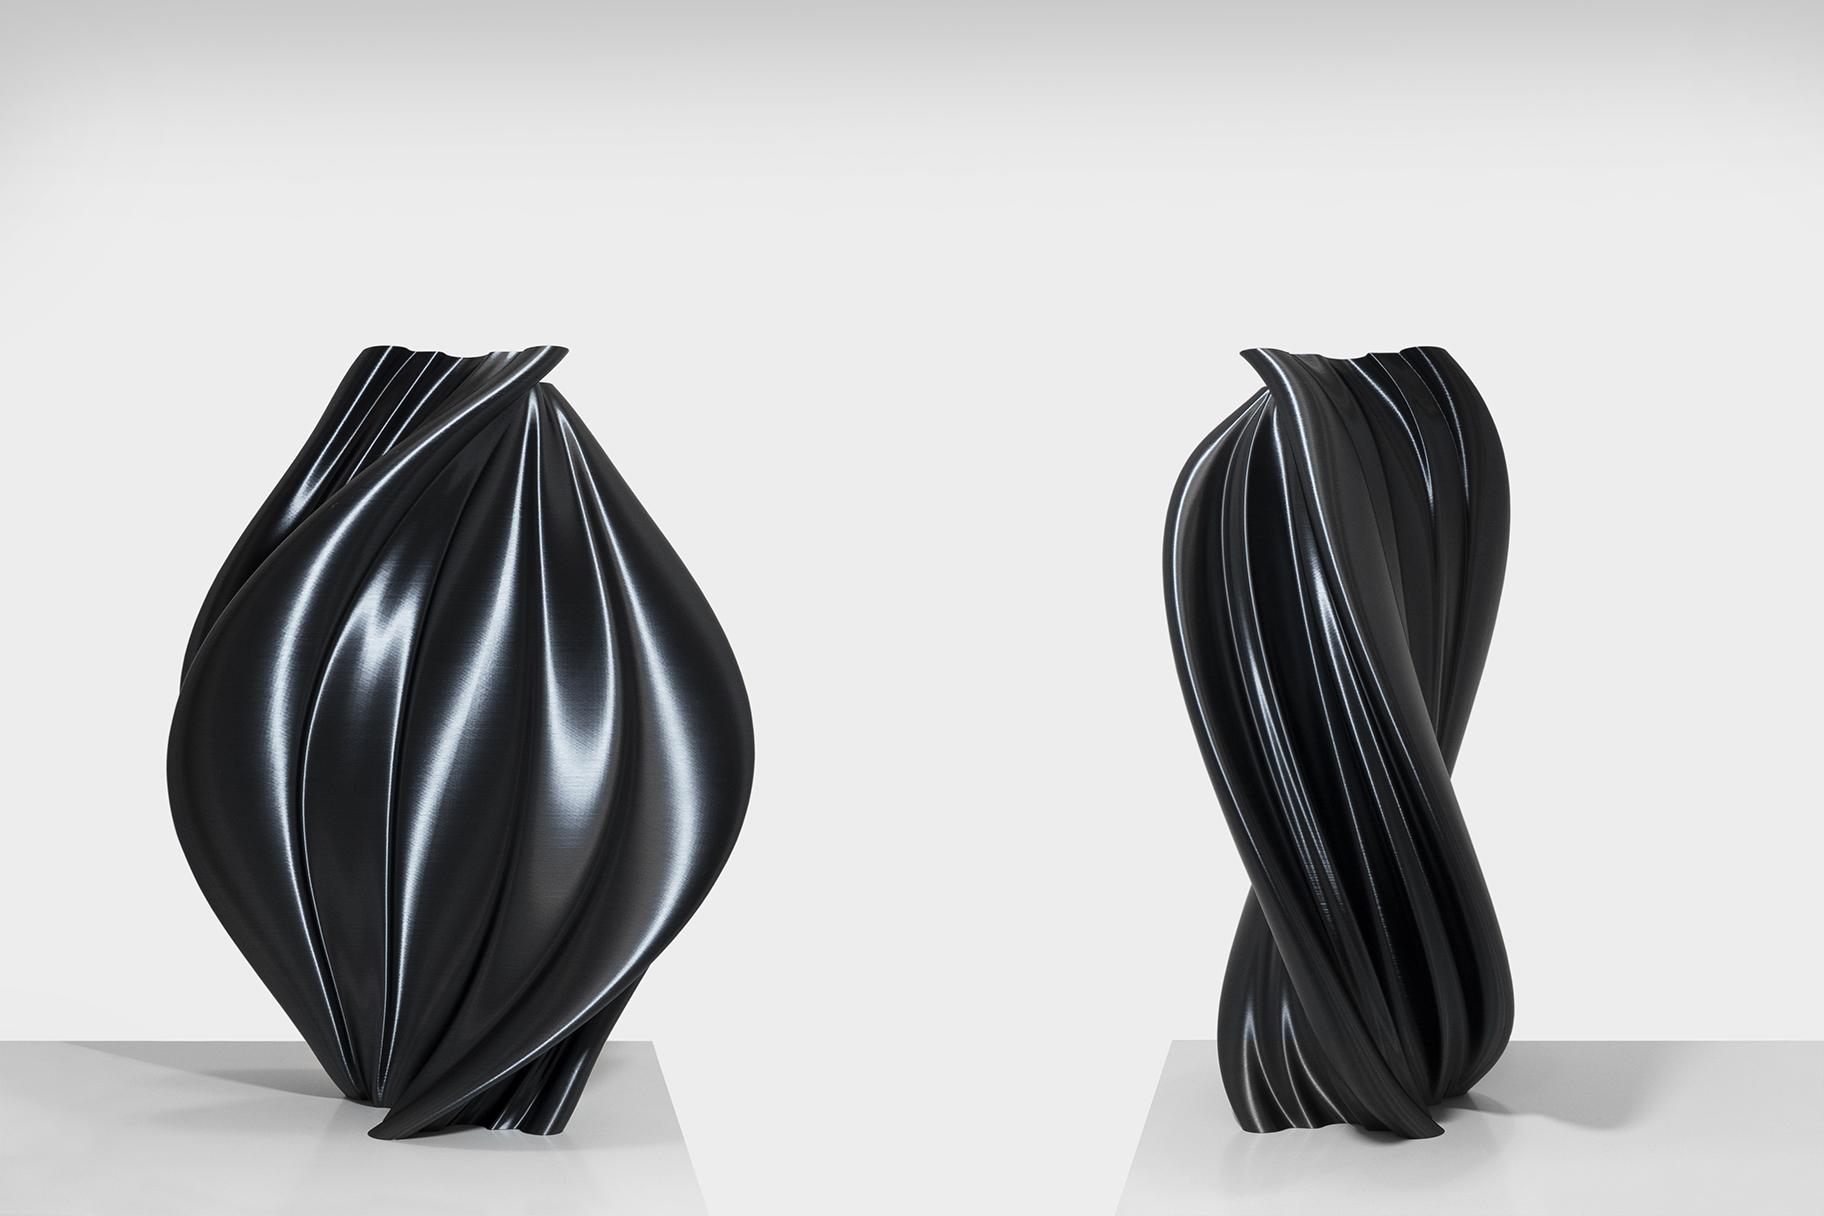 Damocle Obsidian Black Dygodesign